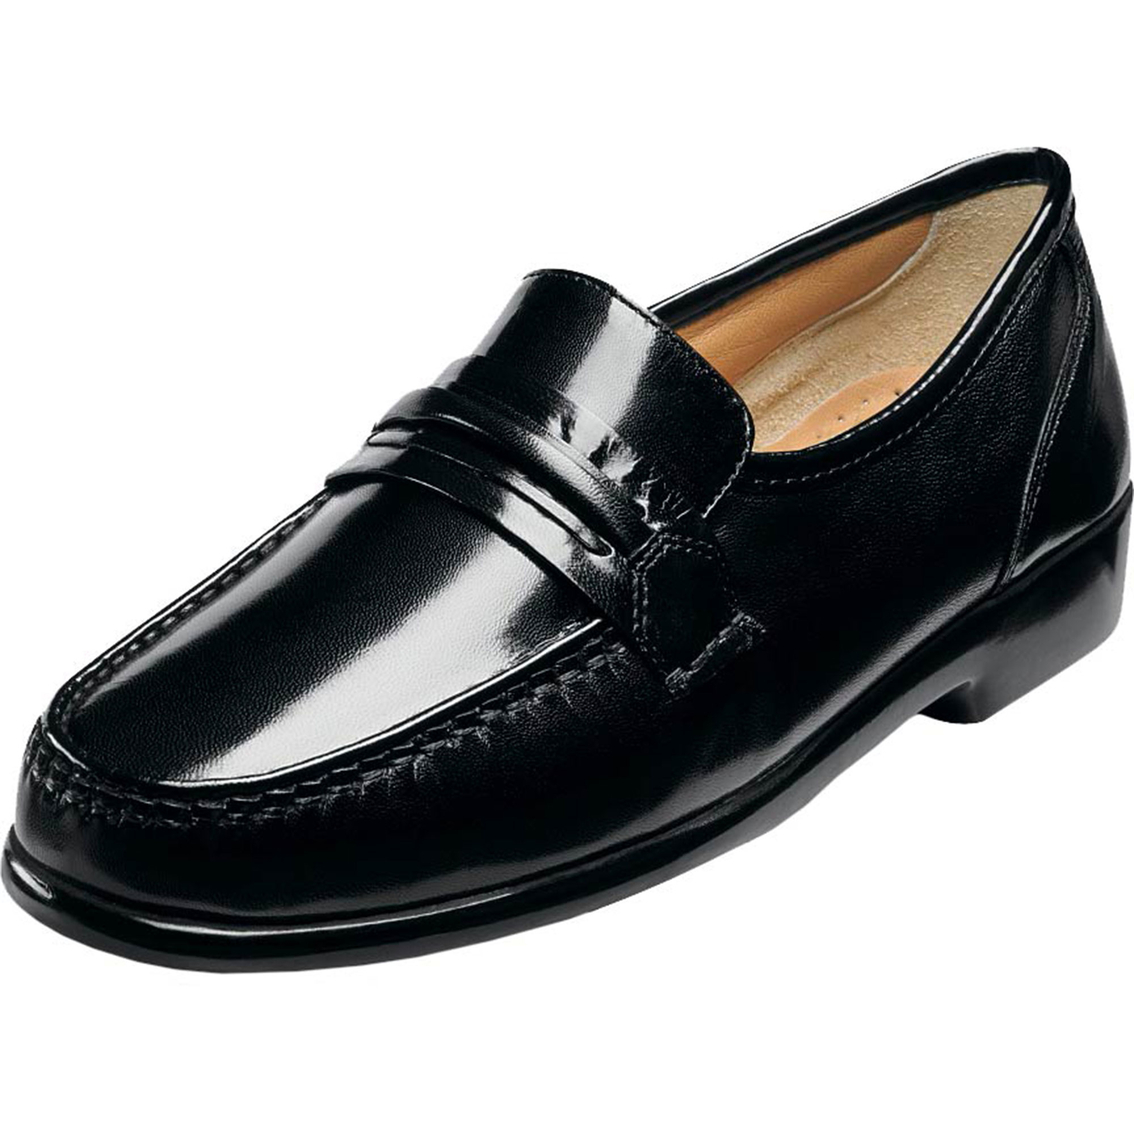 8fa4073e920 Nunn Bush Men's Bentley Dress Casual Loafers | Dress | Shoes | Shop ...